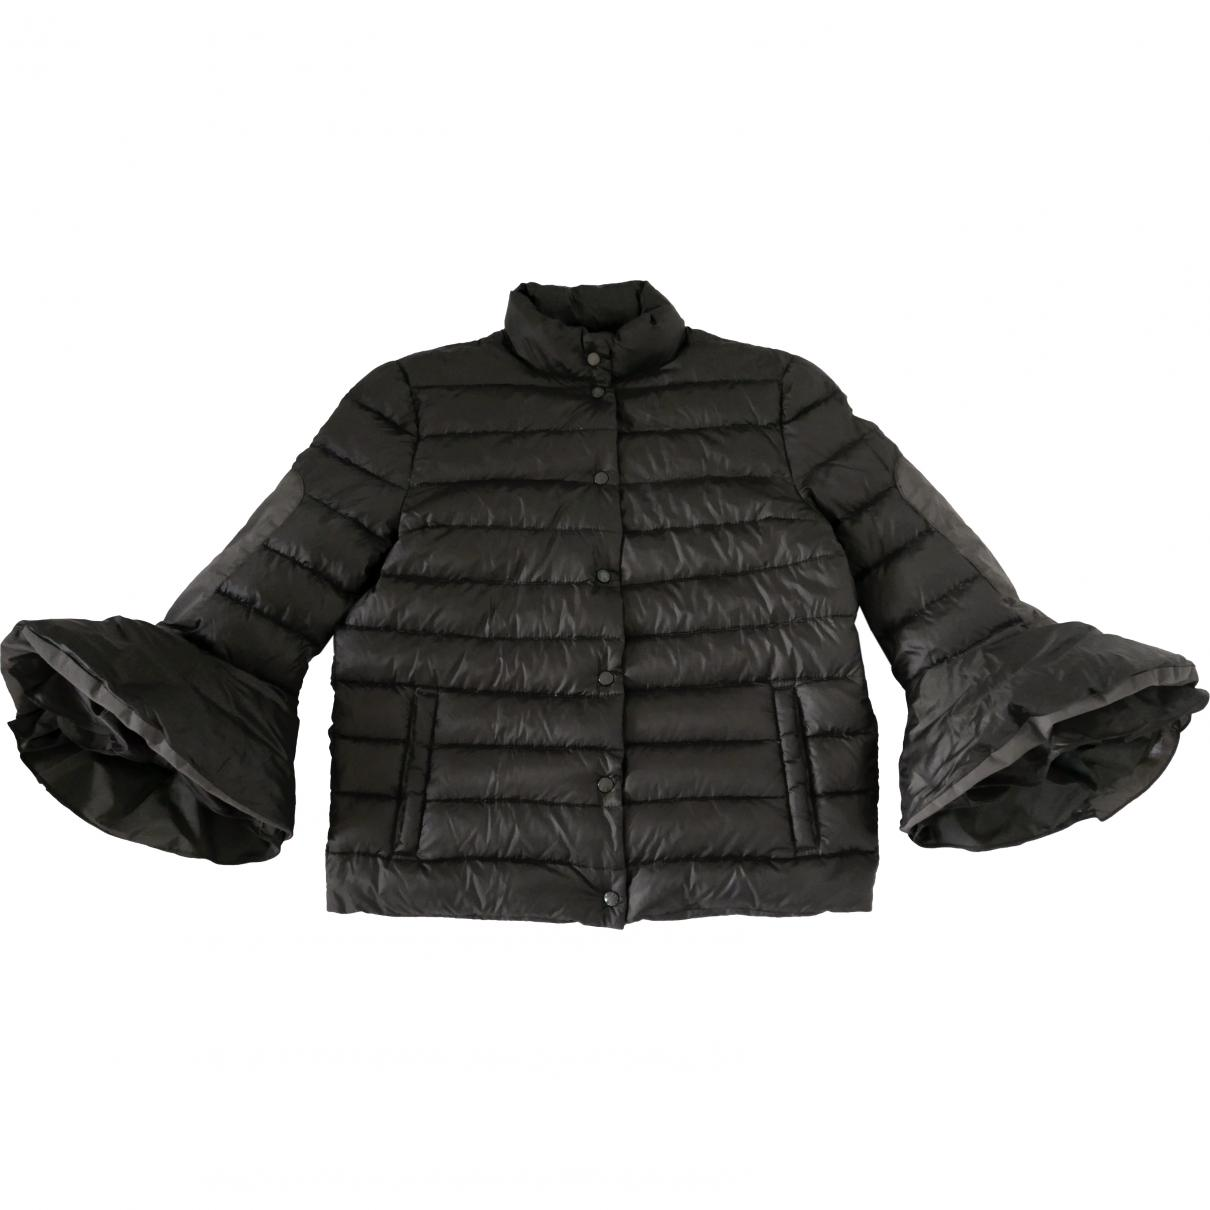 0c9abec3b Moncler Jacket in Brown - Lyst